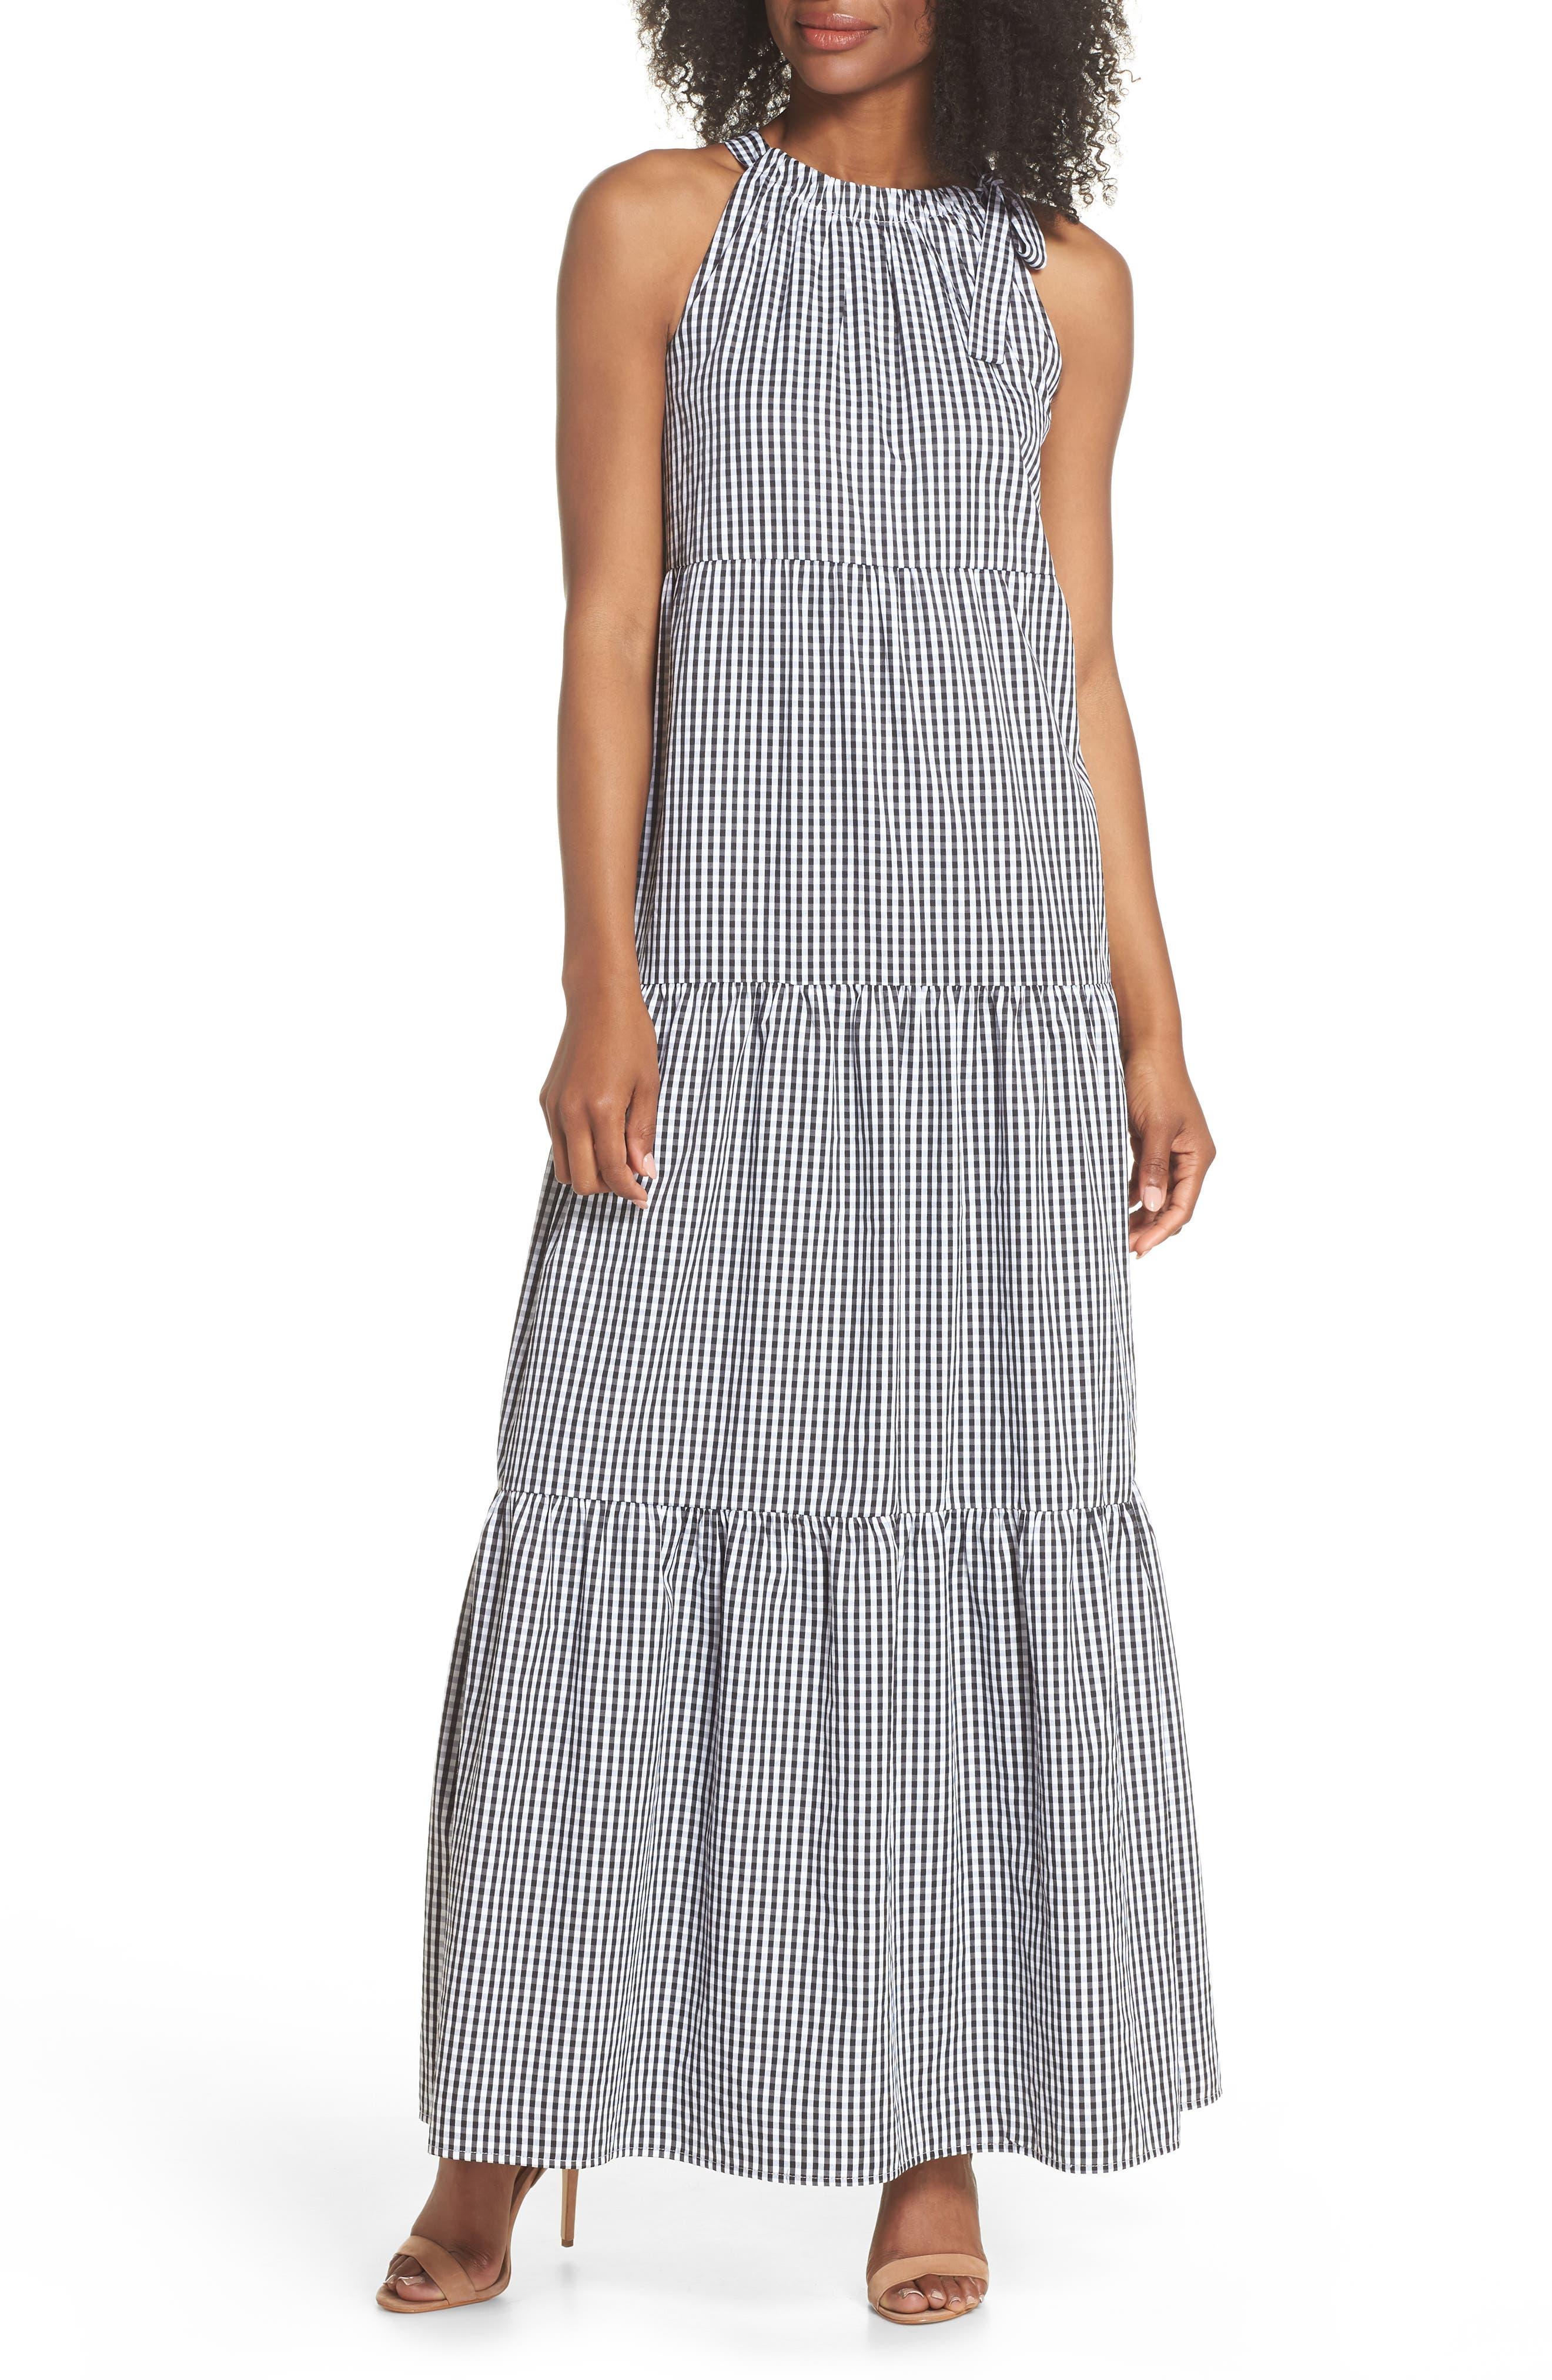 Gingham Check Maxi Dress,                         Main,                         color, 100